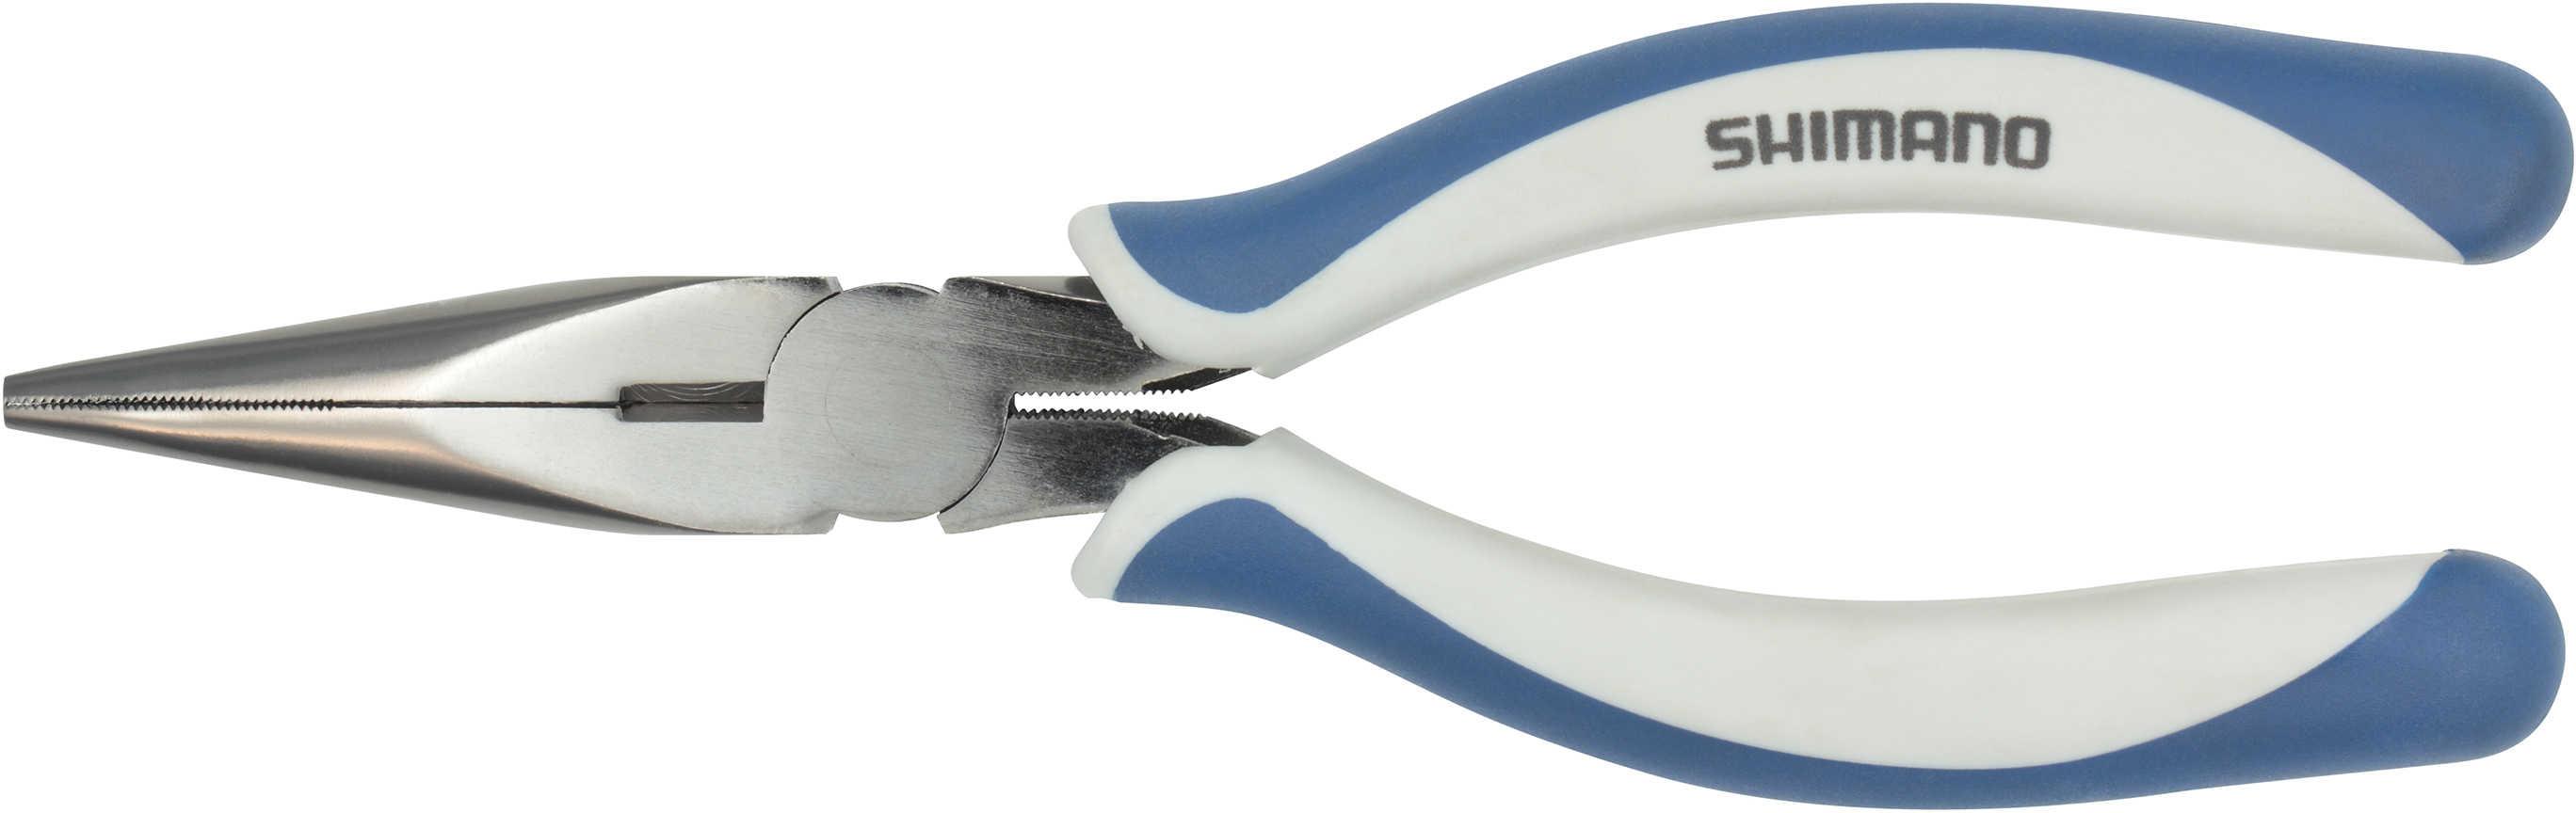 Shimano Brutus Tool 8in Pliers Black Nickel Md#: ATBP008